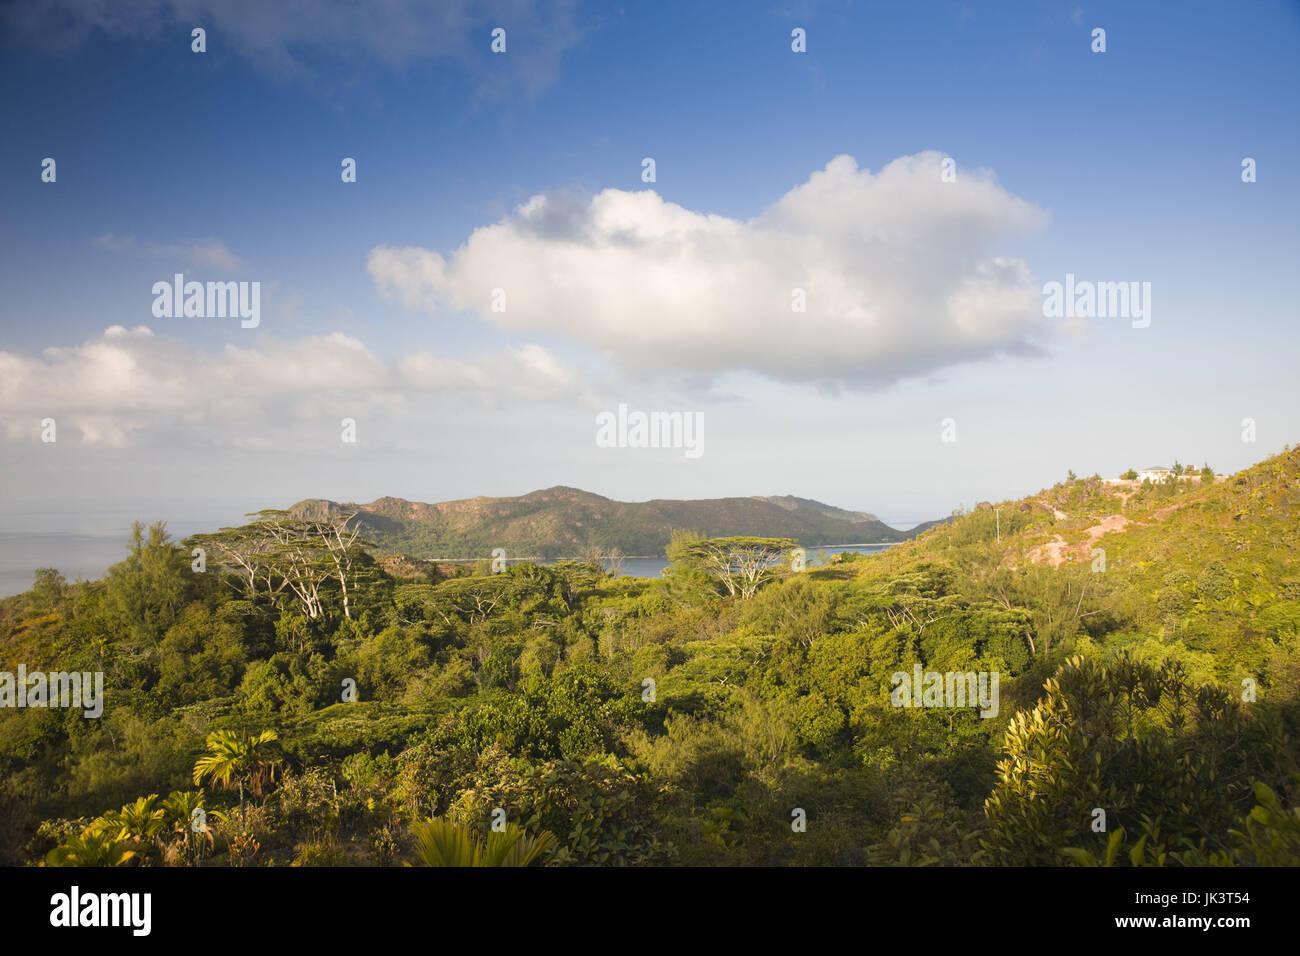 L'île de Praslin, Seychelles, Chevalier Bay, vue vers le nord de Grand Fond (el. 340 mètres) Photo Stock